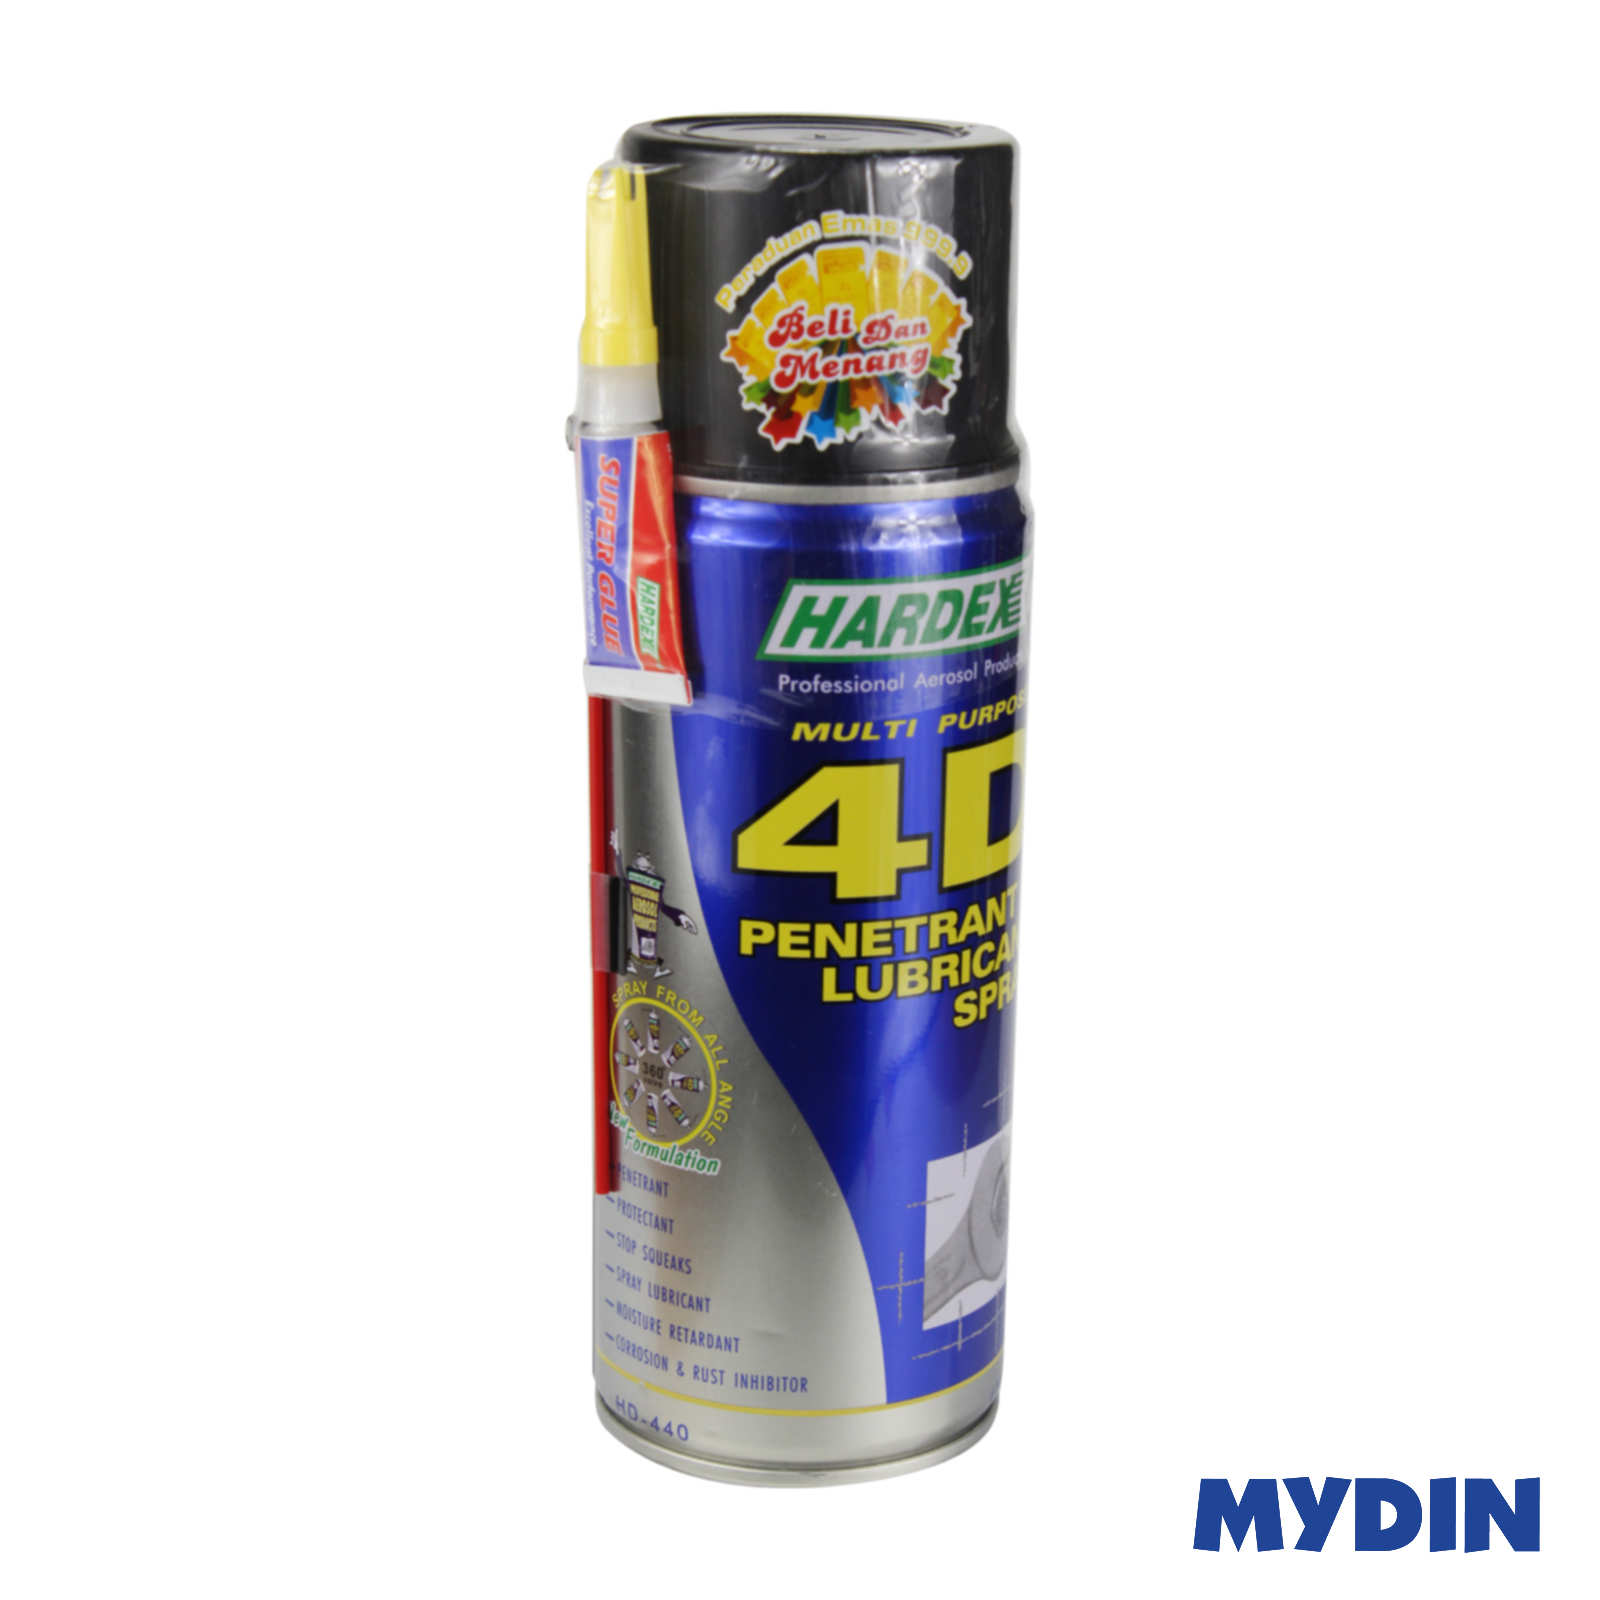 Hardex 4D Penetrant & Lubricant Spray 400ml